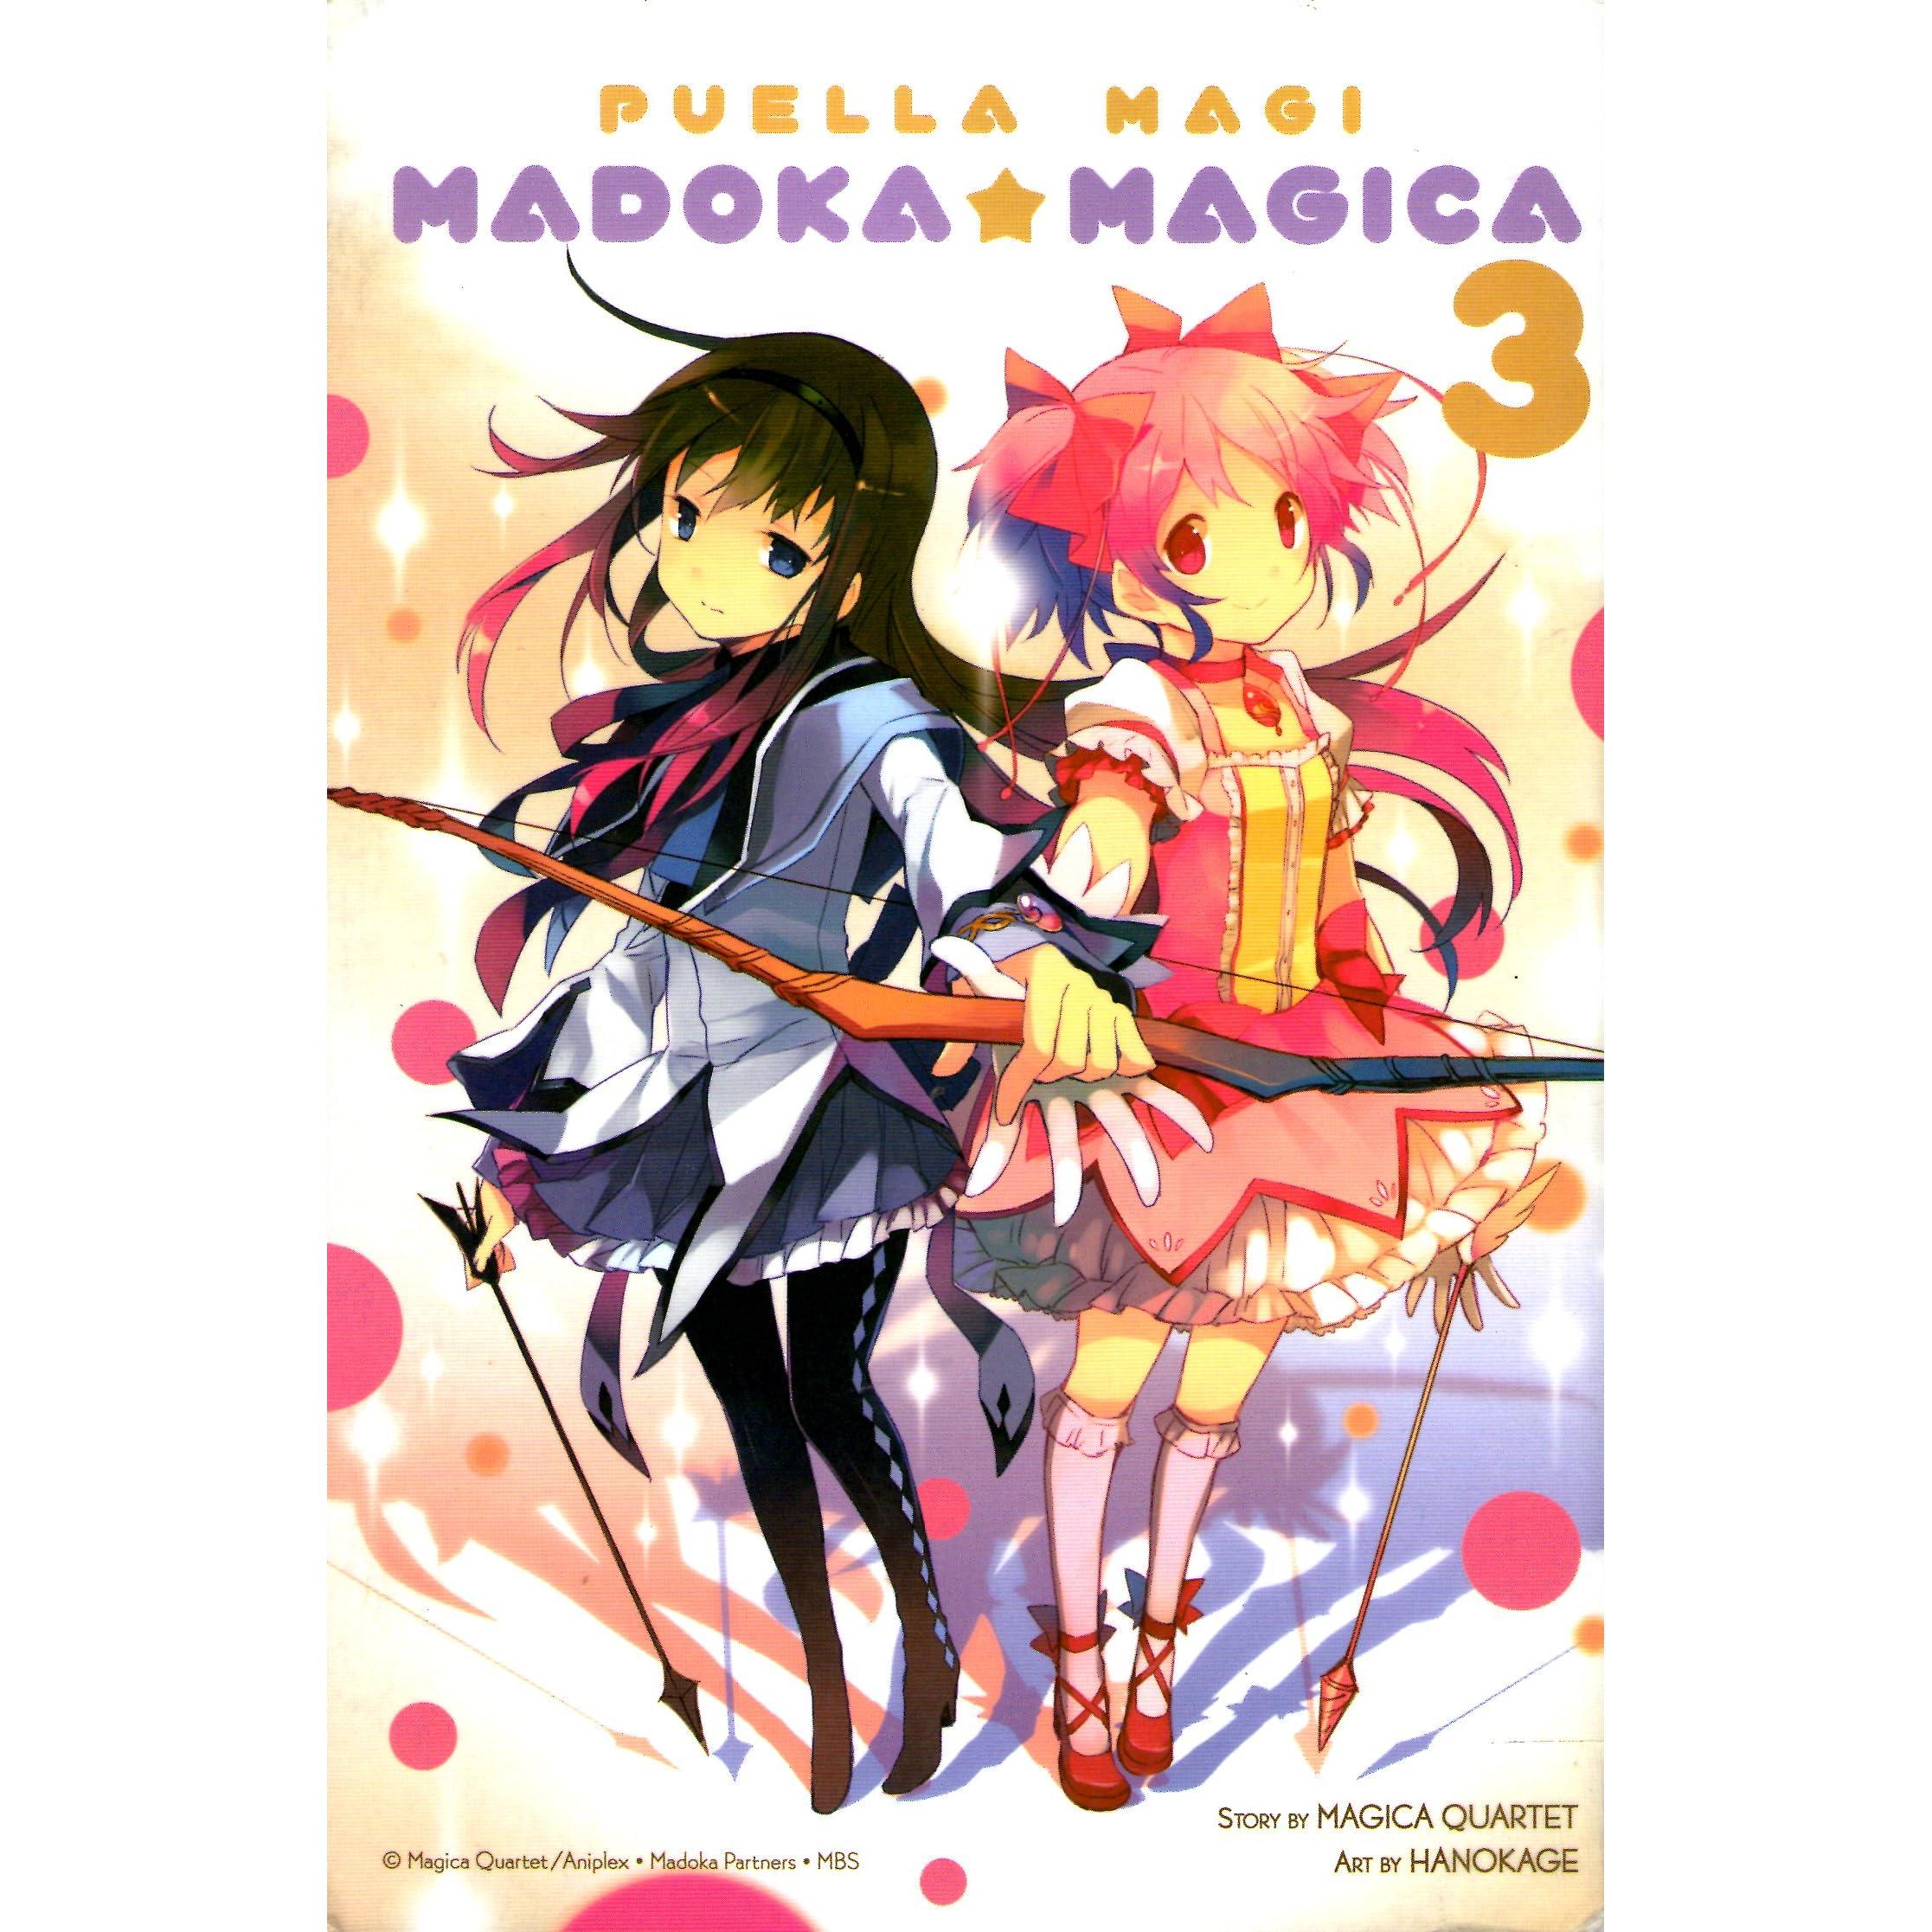 Top Ten Floo Y Wong Artist Puella Magi Madoka Magica Character Creator